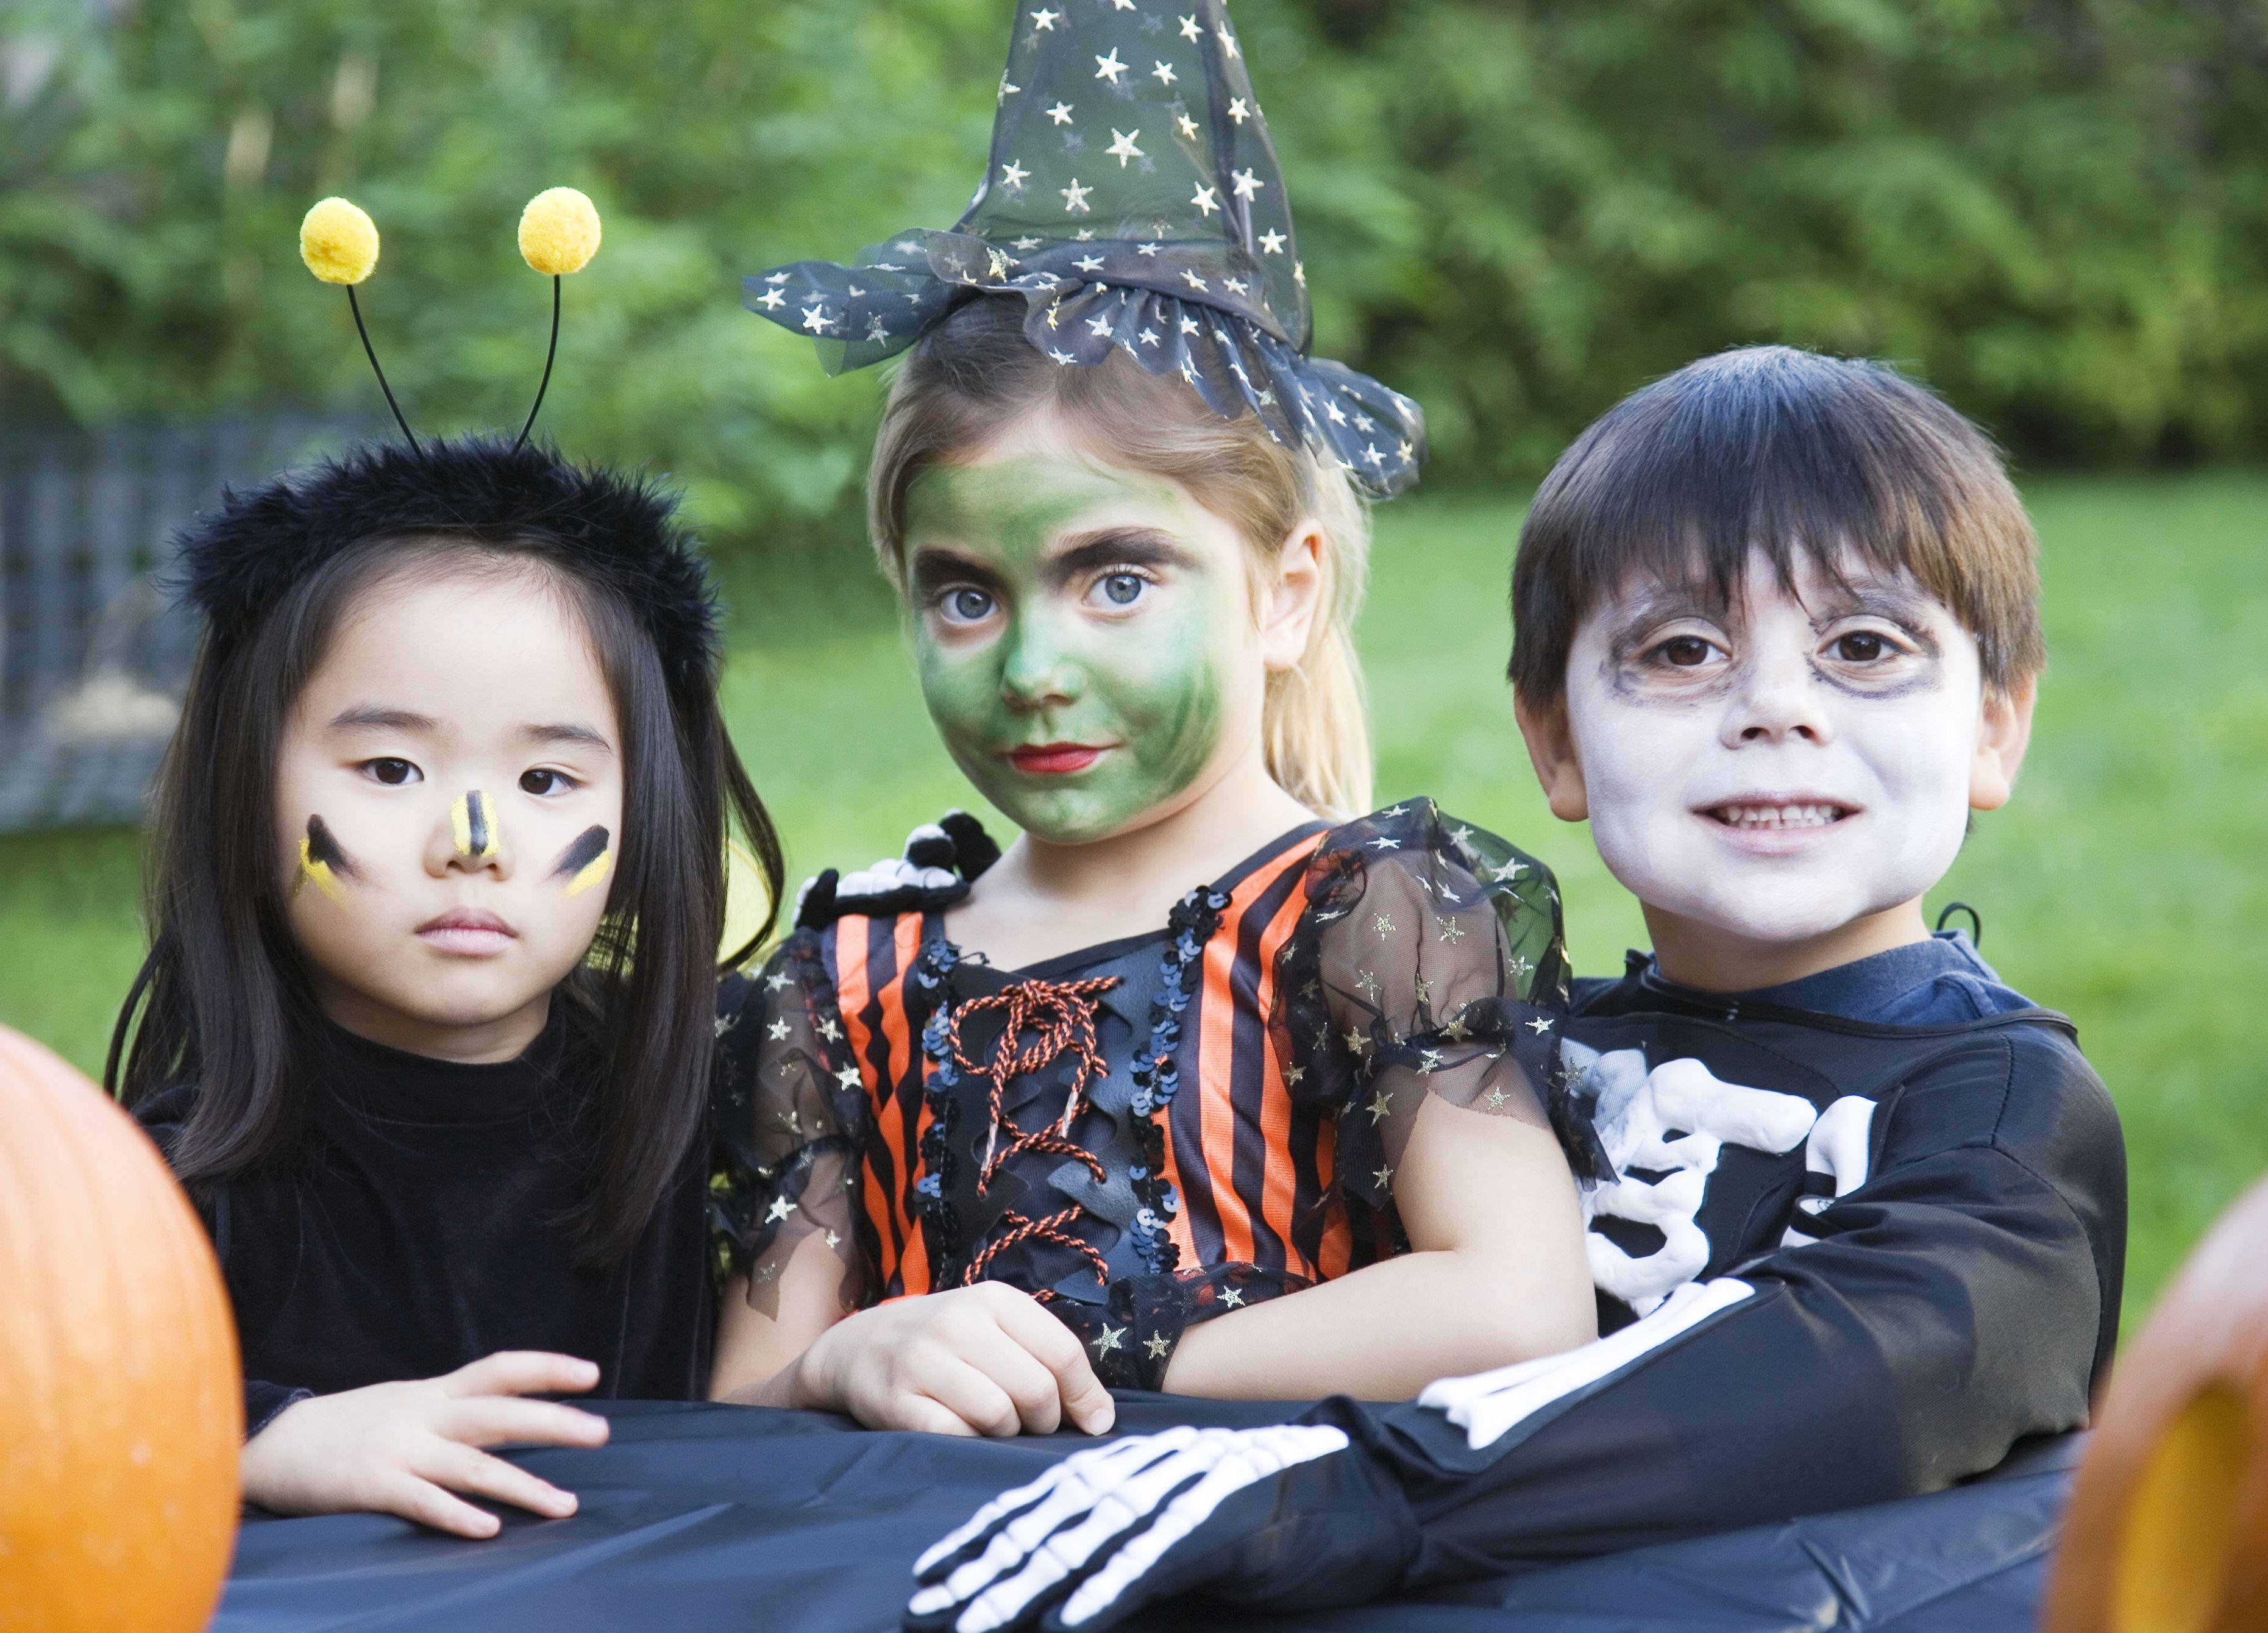 17 fun halloween party games for kids - Fun Halloween Kids Games